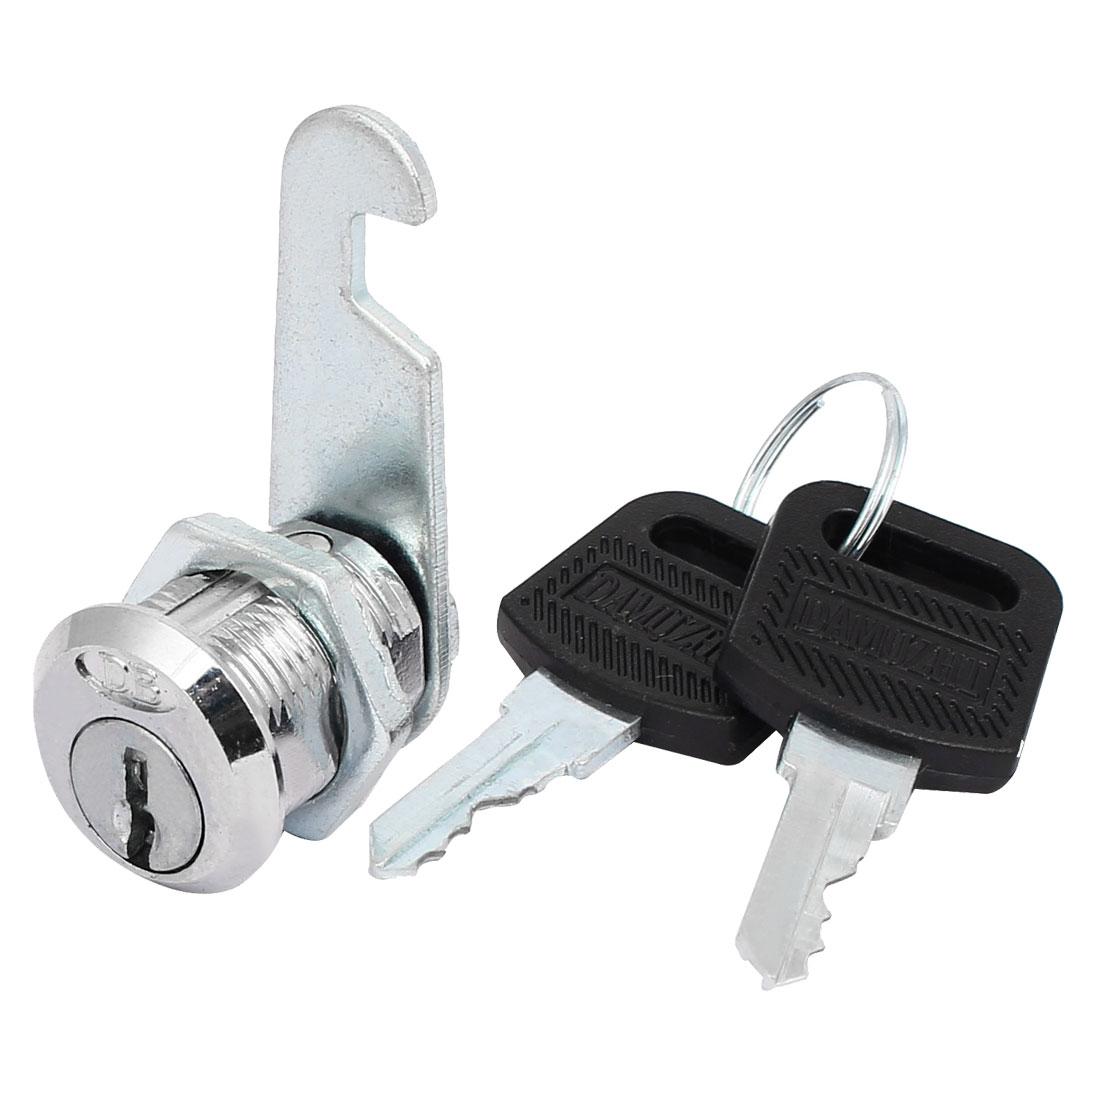 Wardrobe Cabinet Metal Tubular Cam Lock Lockset Silver Tone w 2 Keys